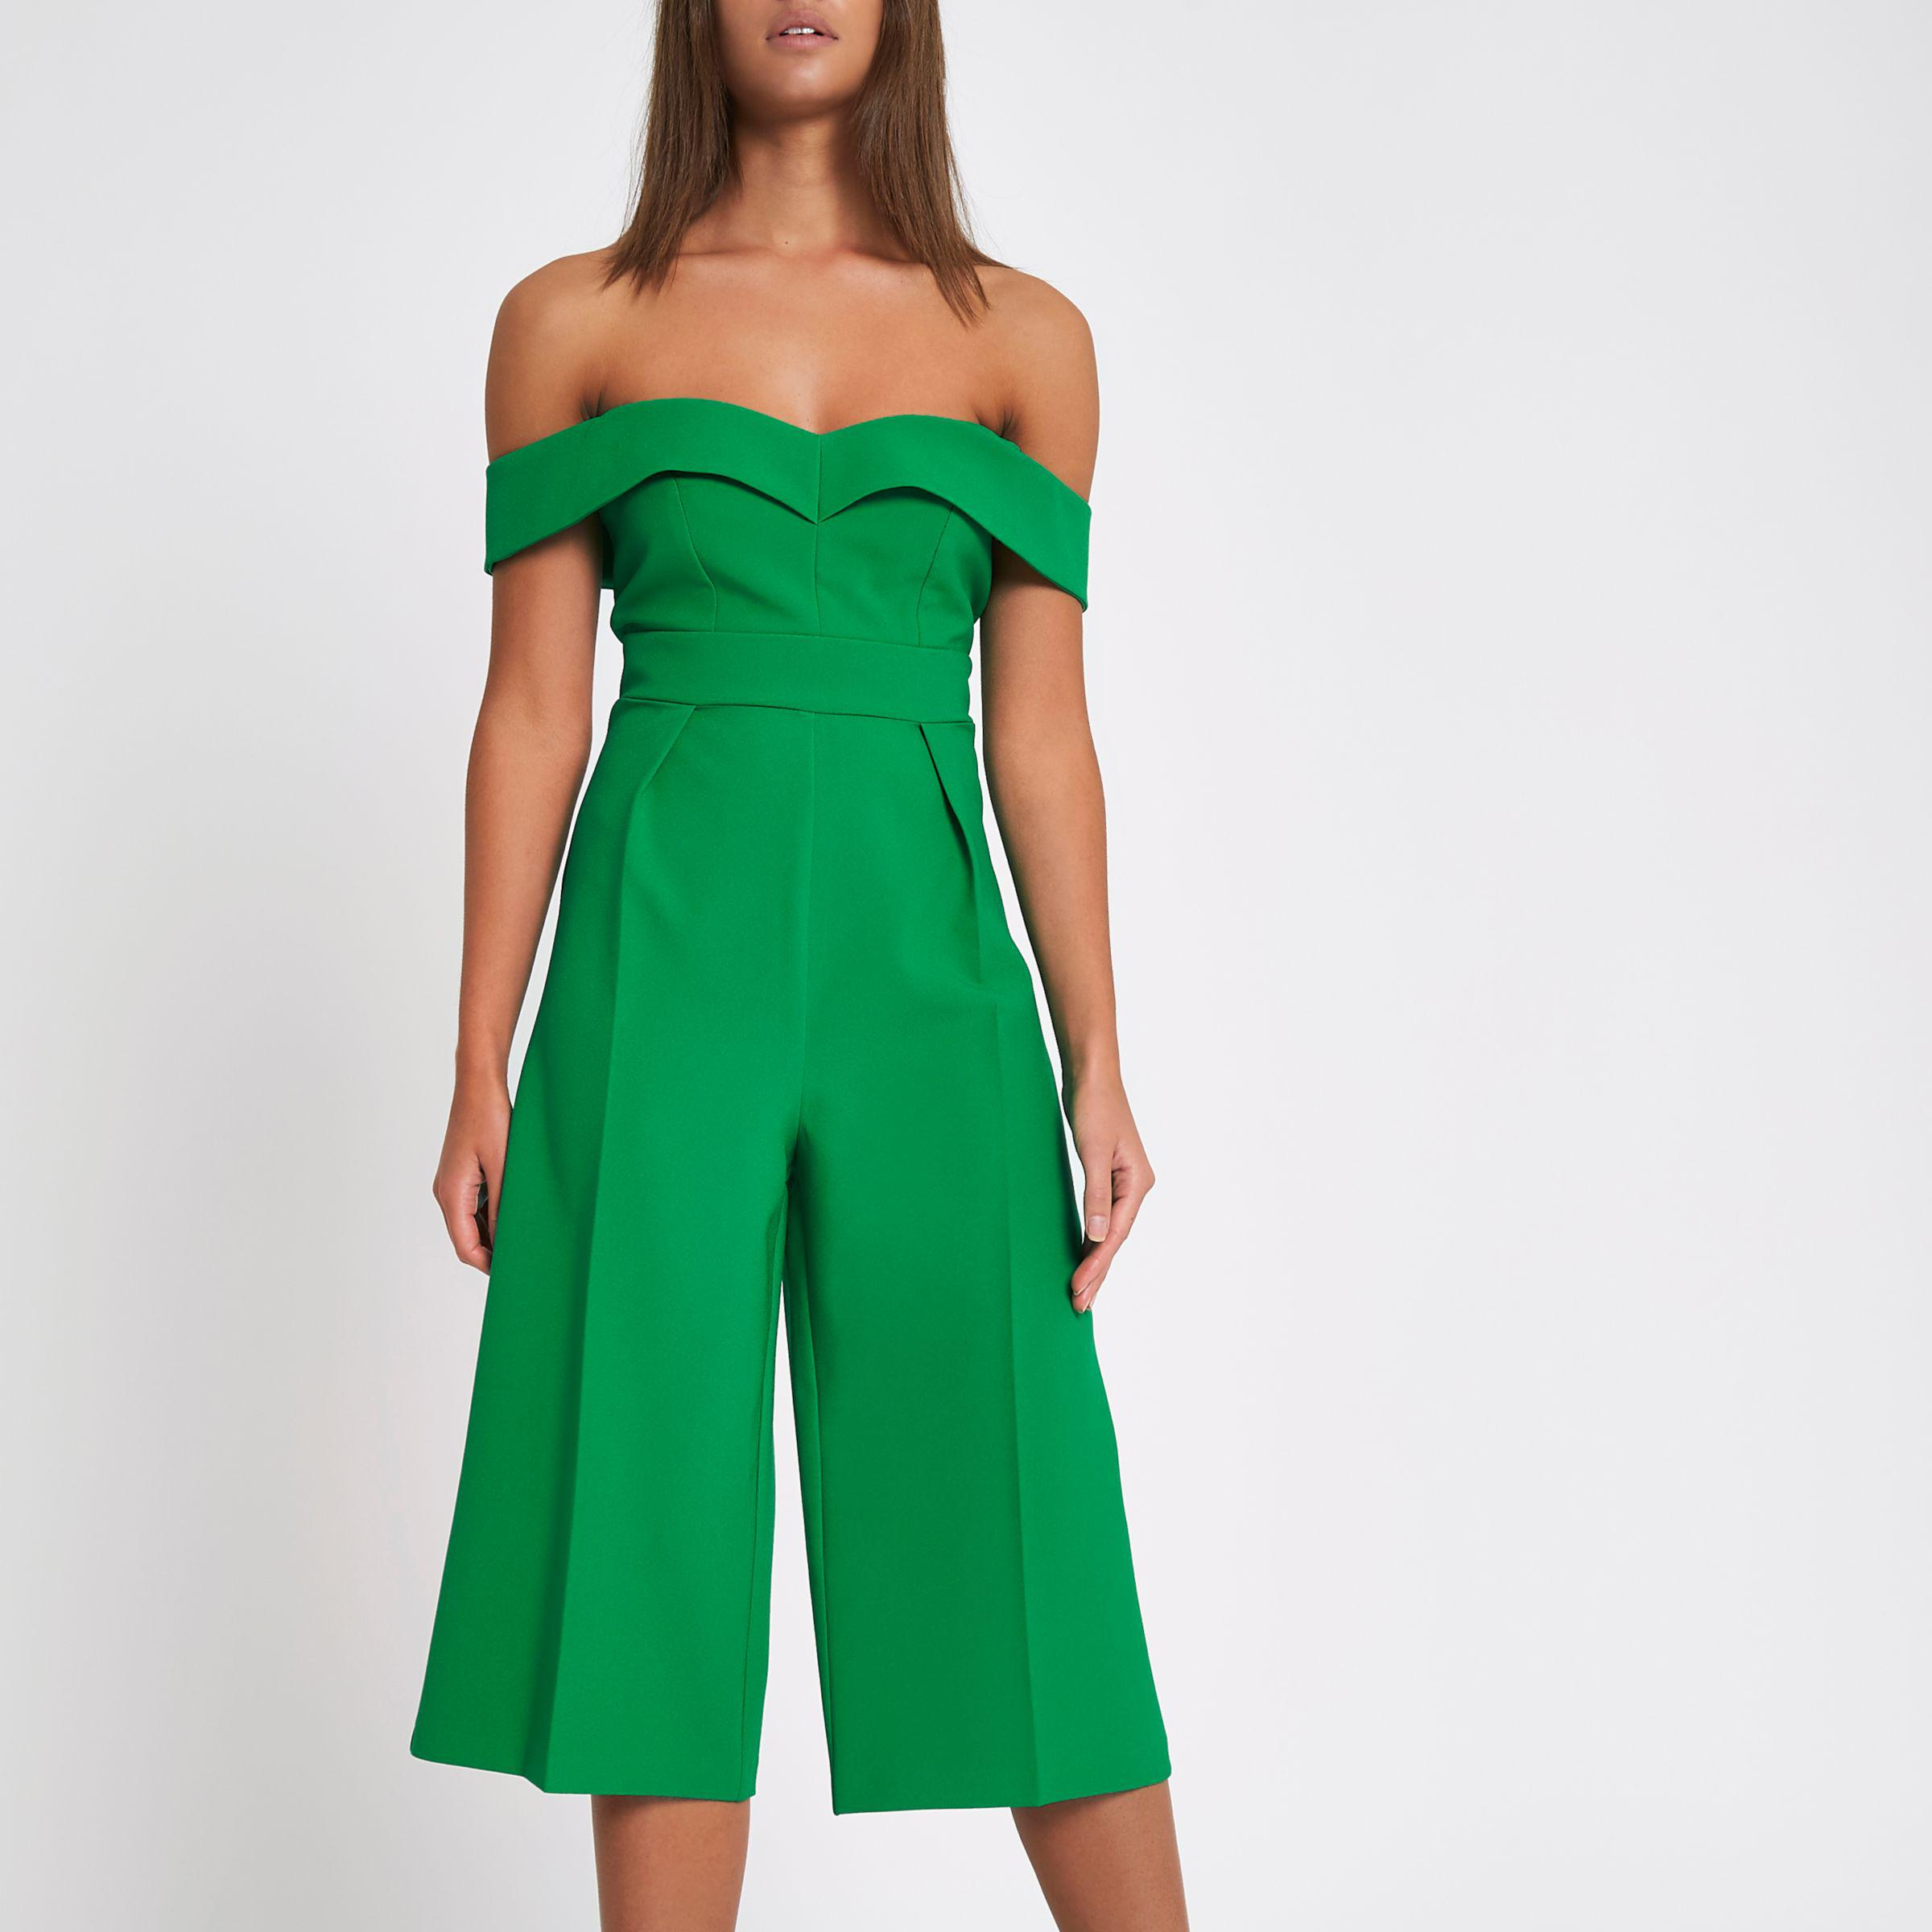 65c8ea4b5f6 Lyst - River Island Green Bardot Culotte Jumpsuit in Green